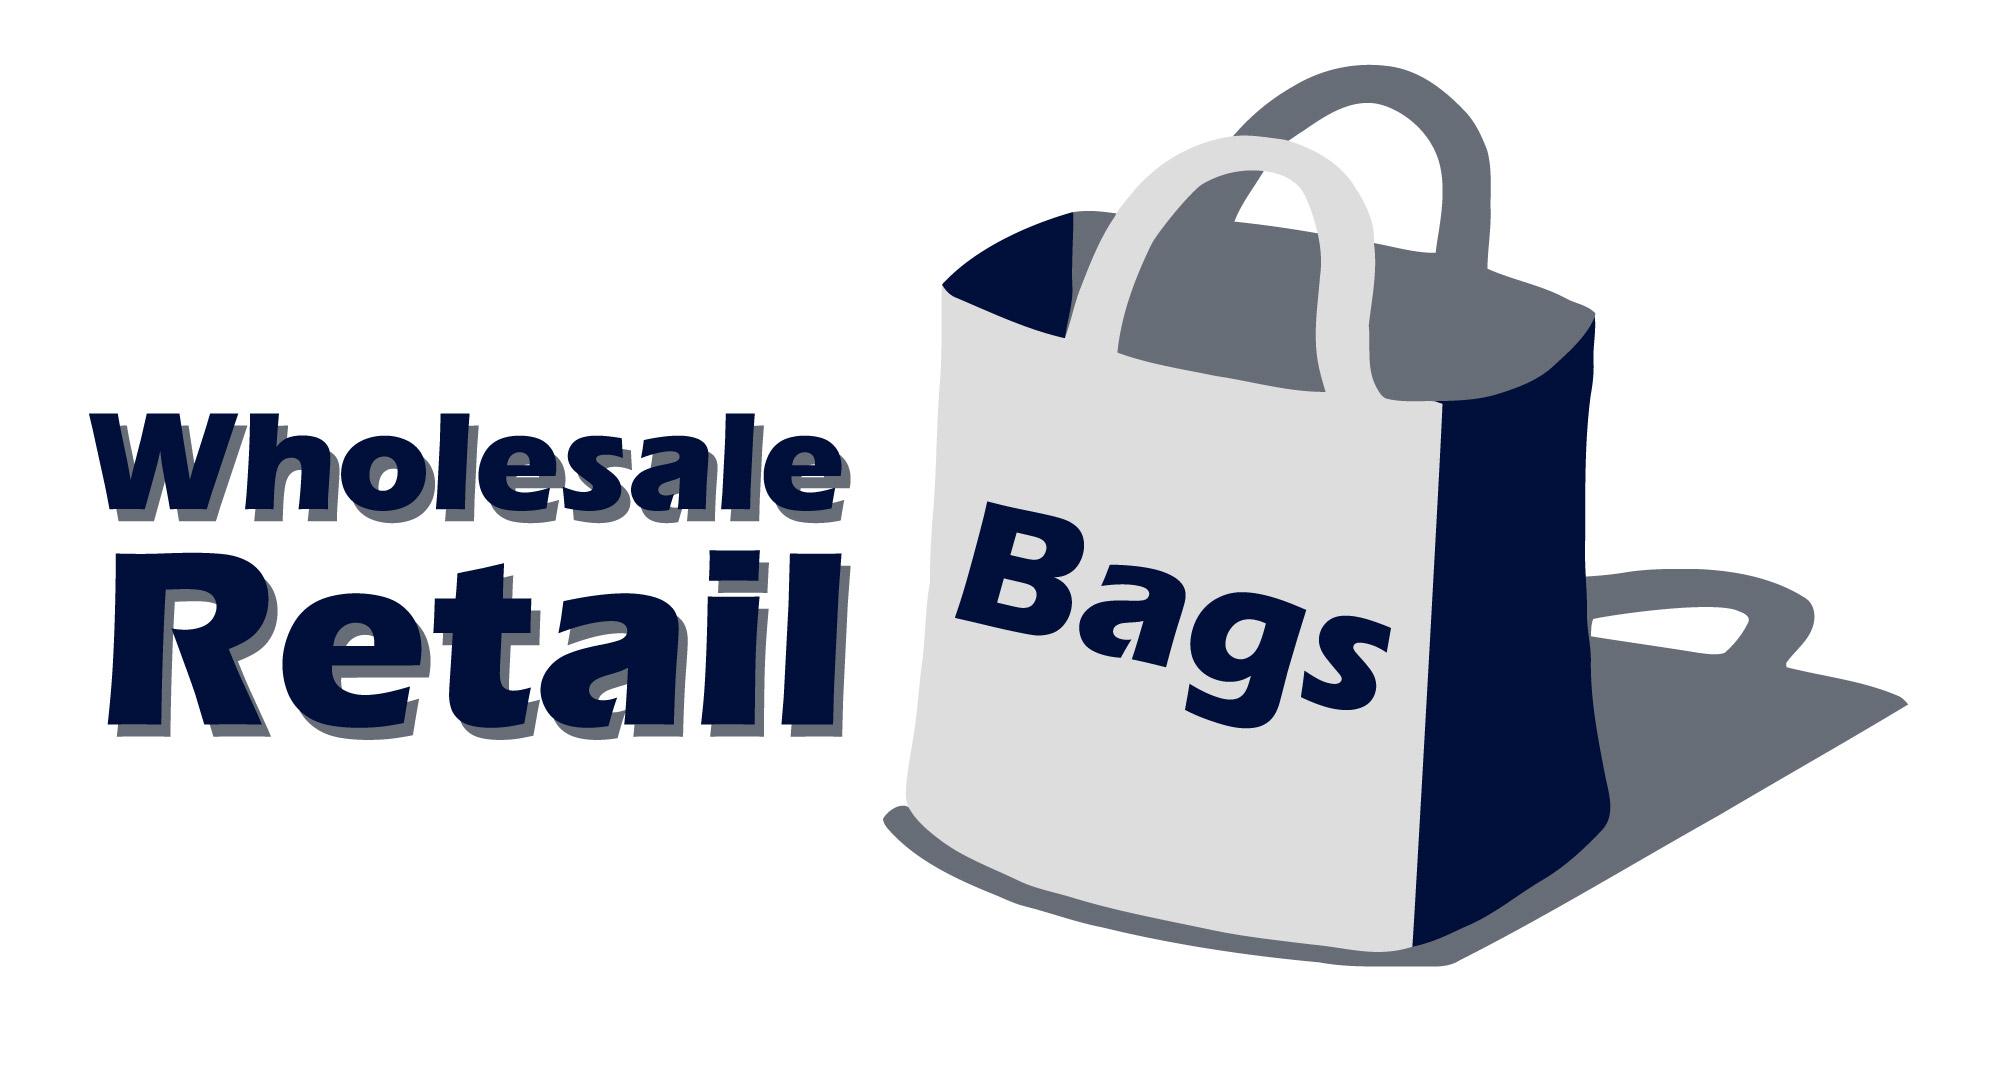 Wholesale Retail Bags